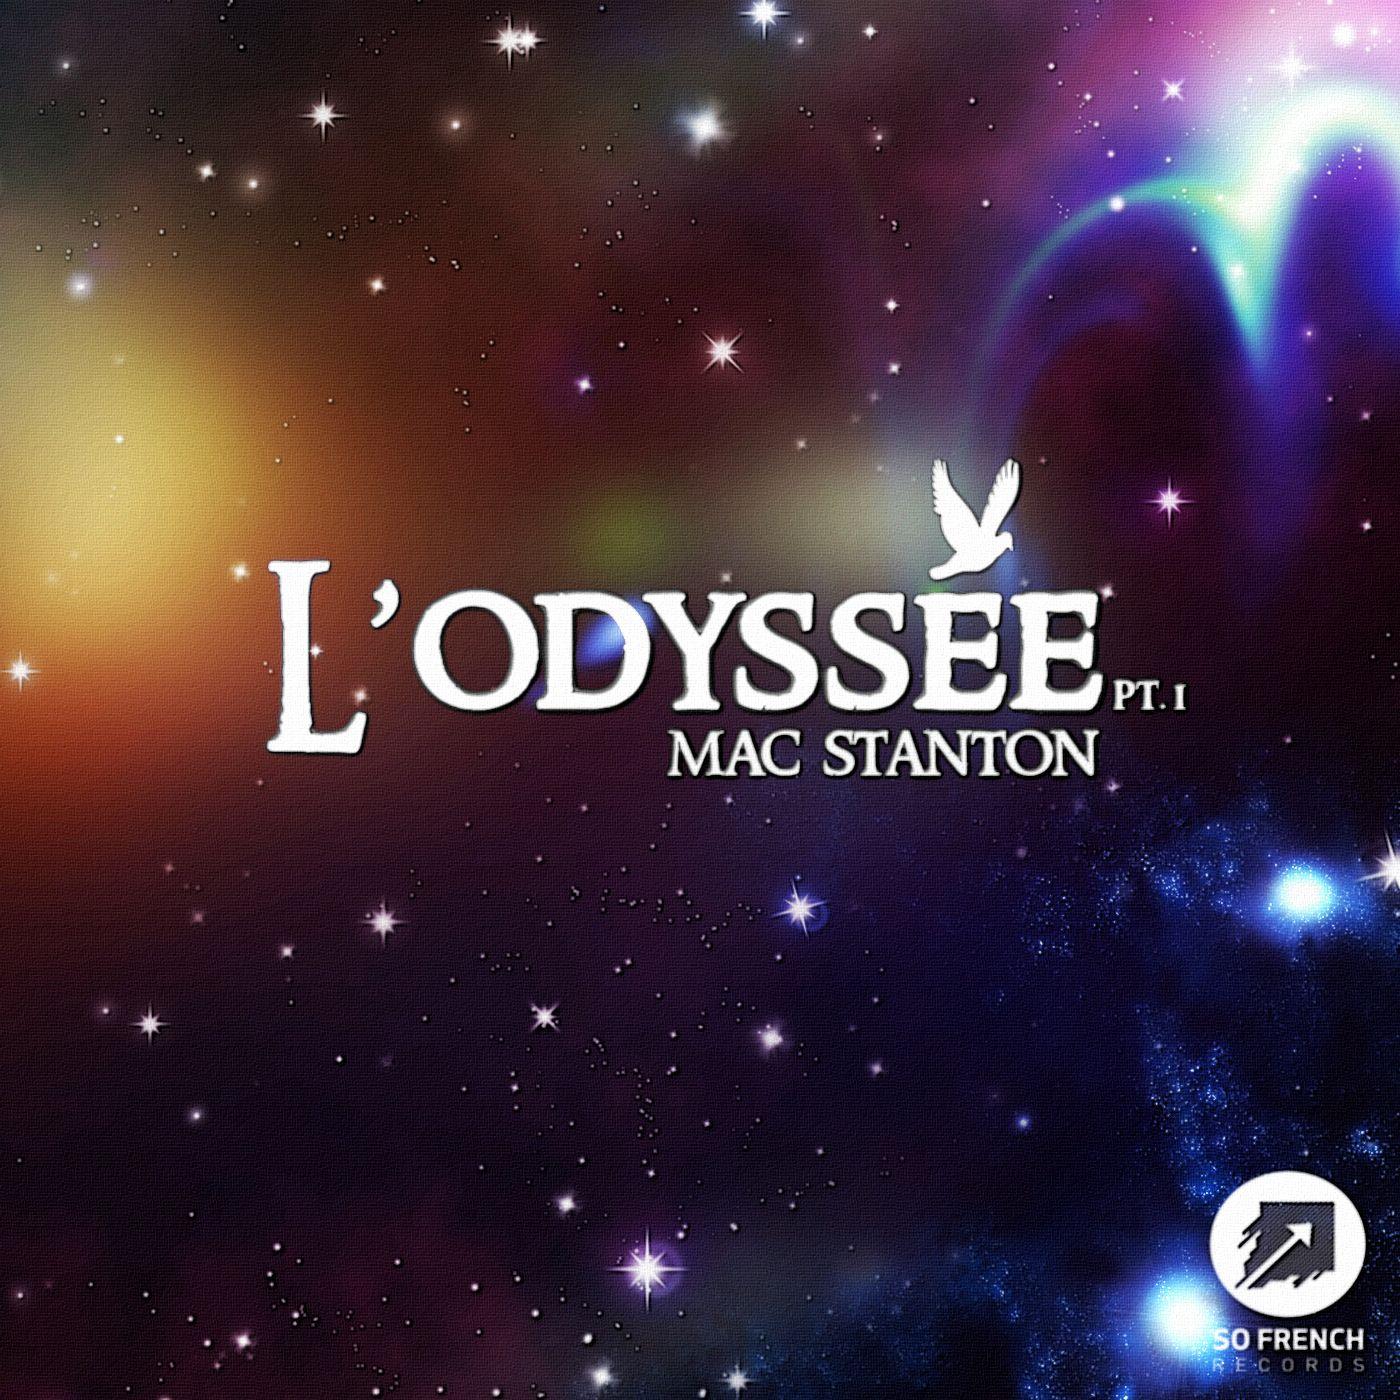 lodyssee_lp_part1-cover_1.jpg